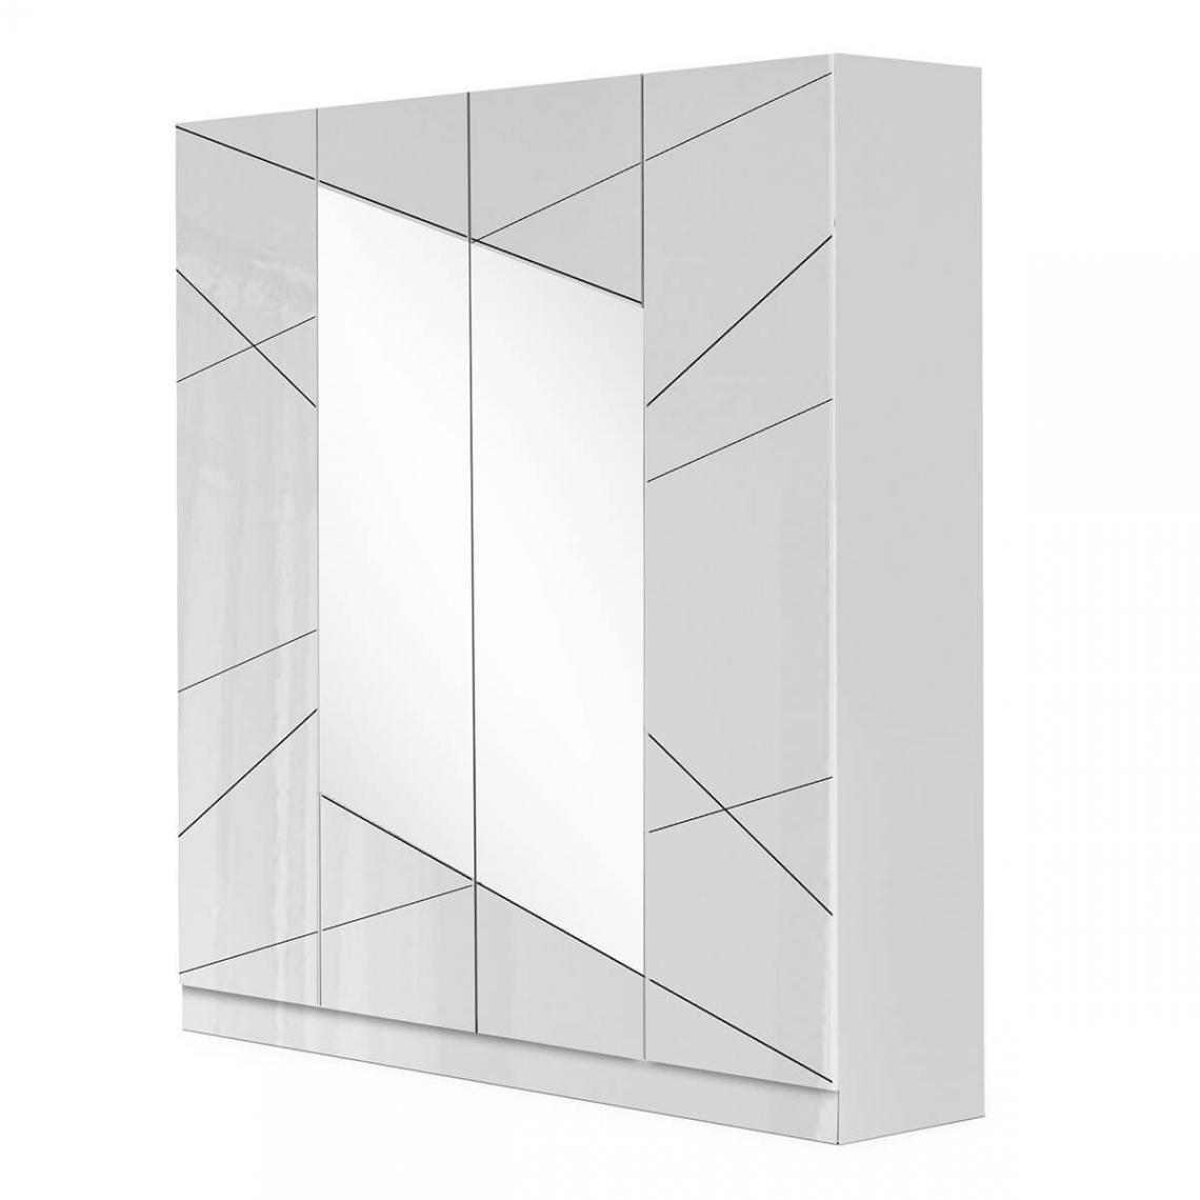 Altobuy MOZAYIK BLANCHE - Armoire 4 Portes avec Miroir Central